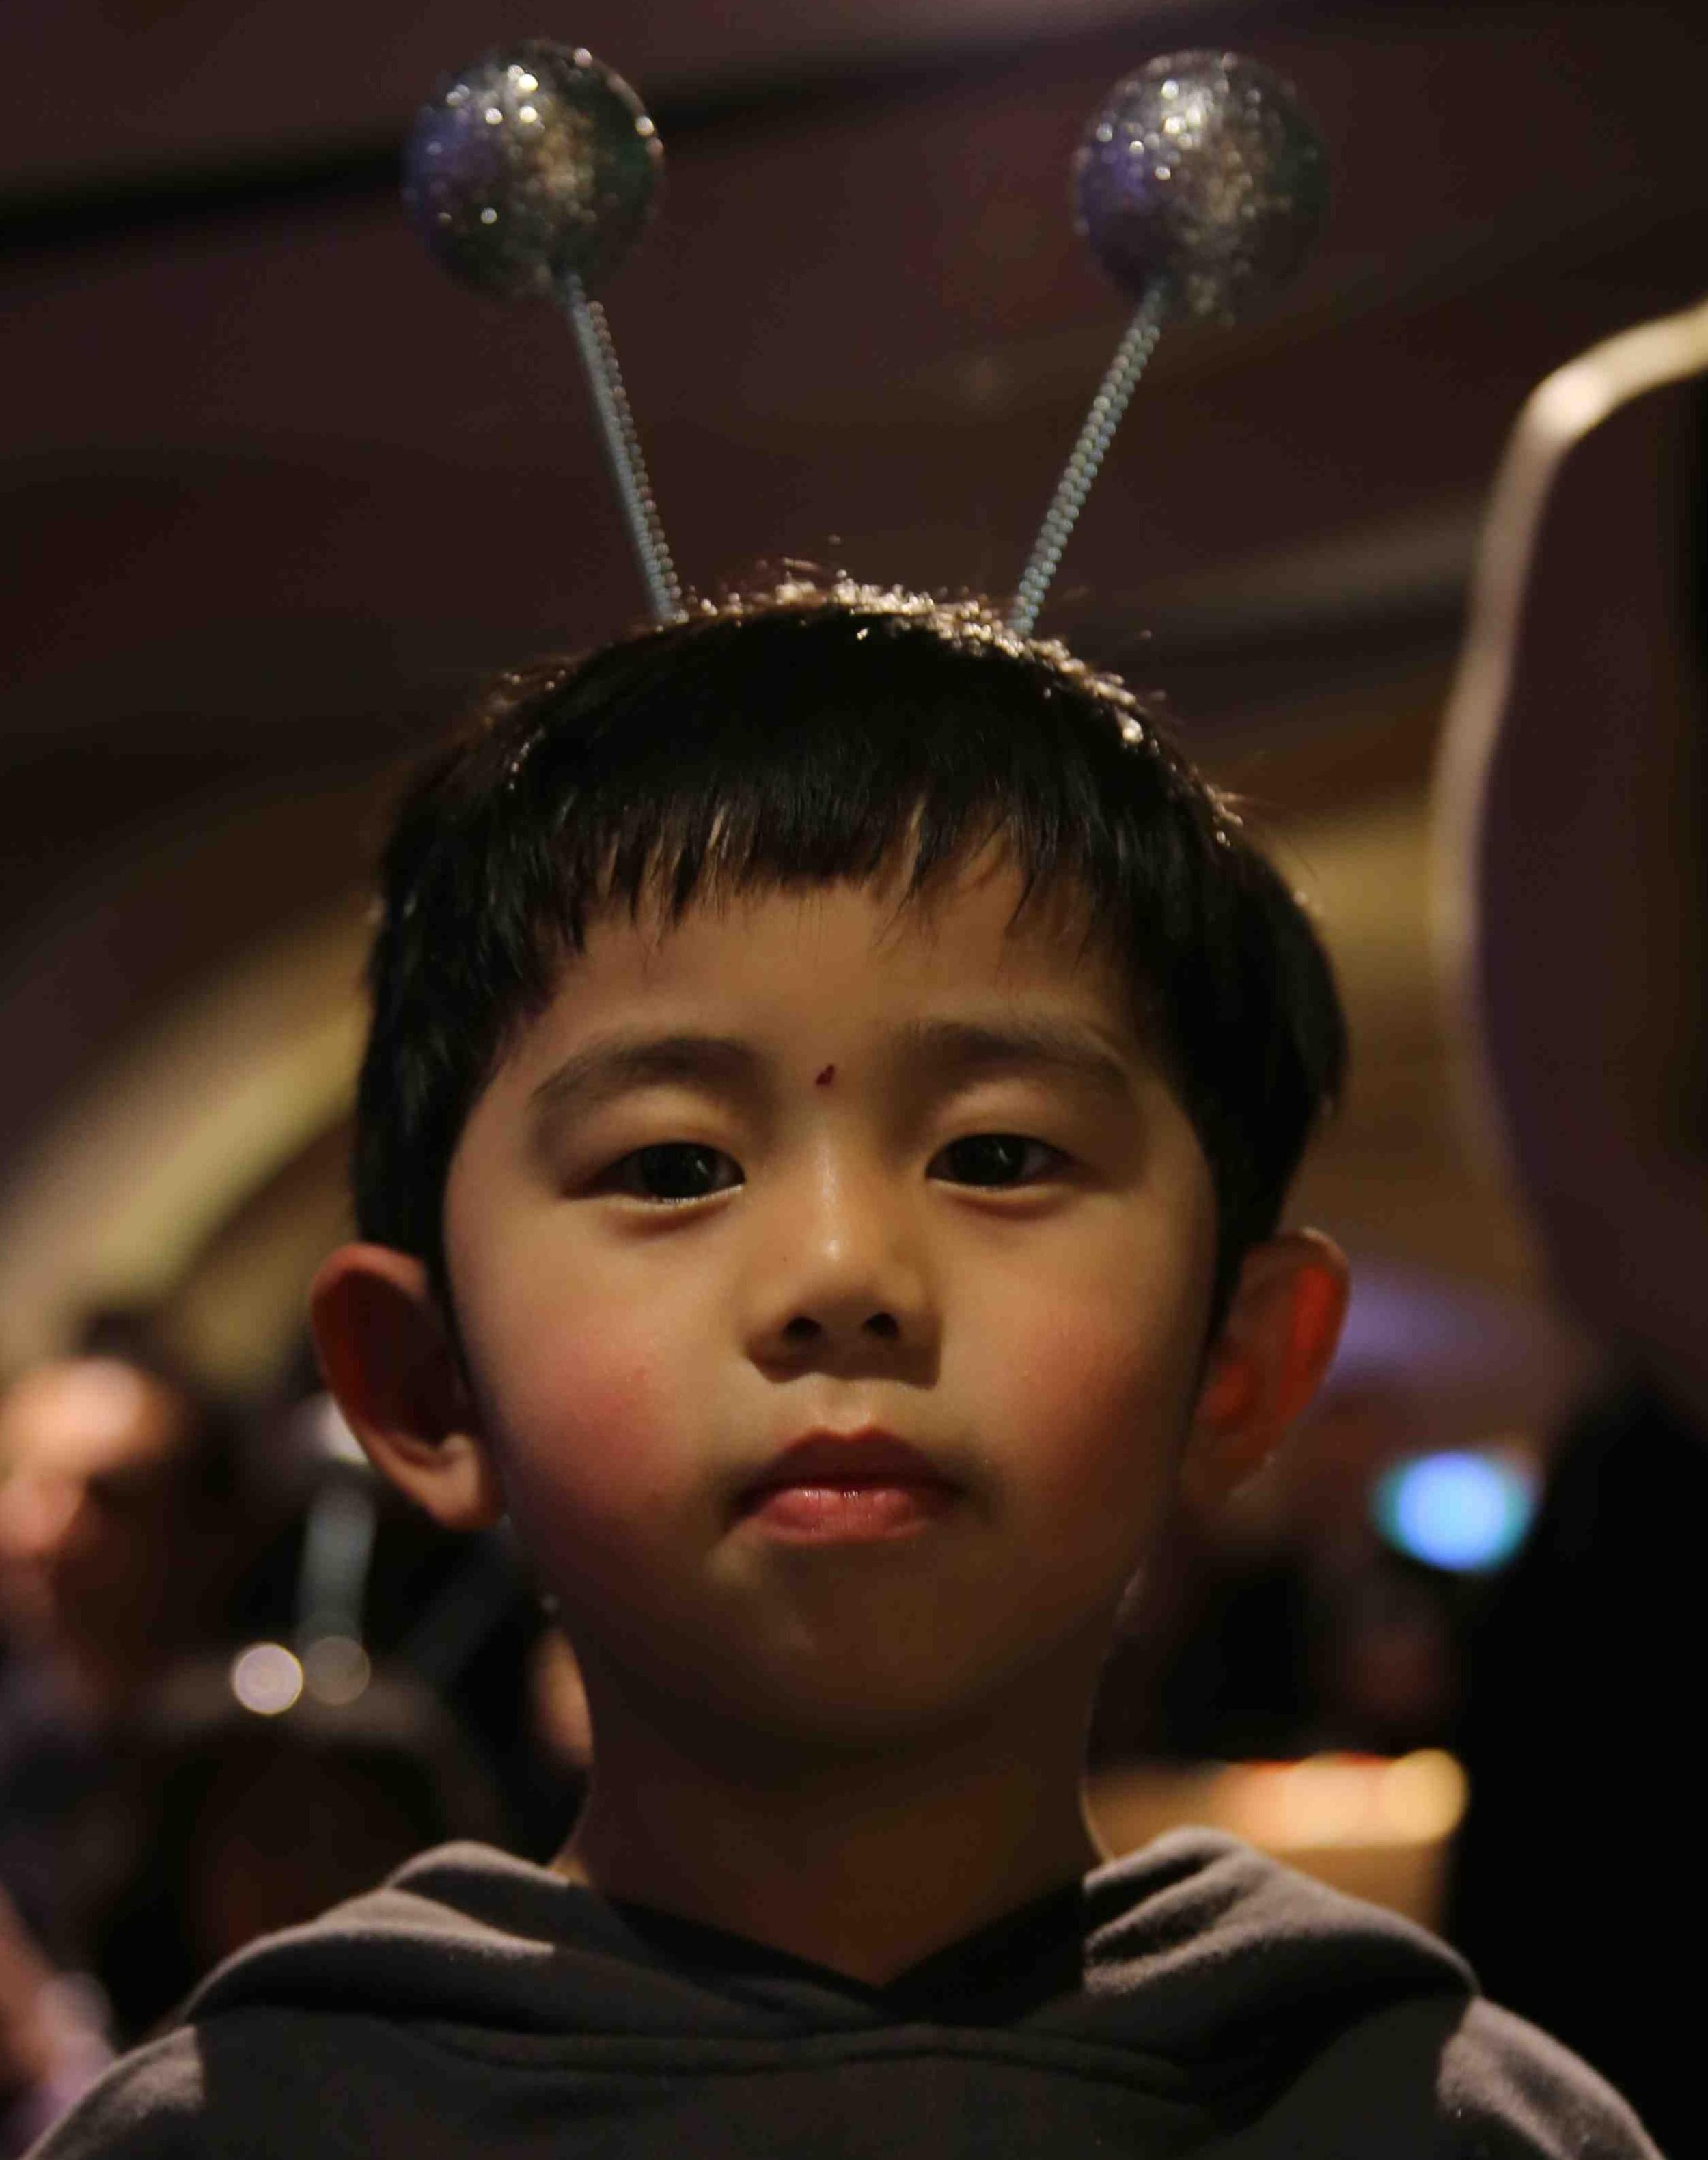 Boy in antennae small